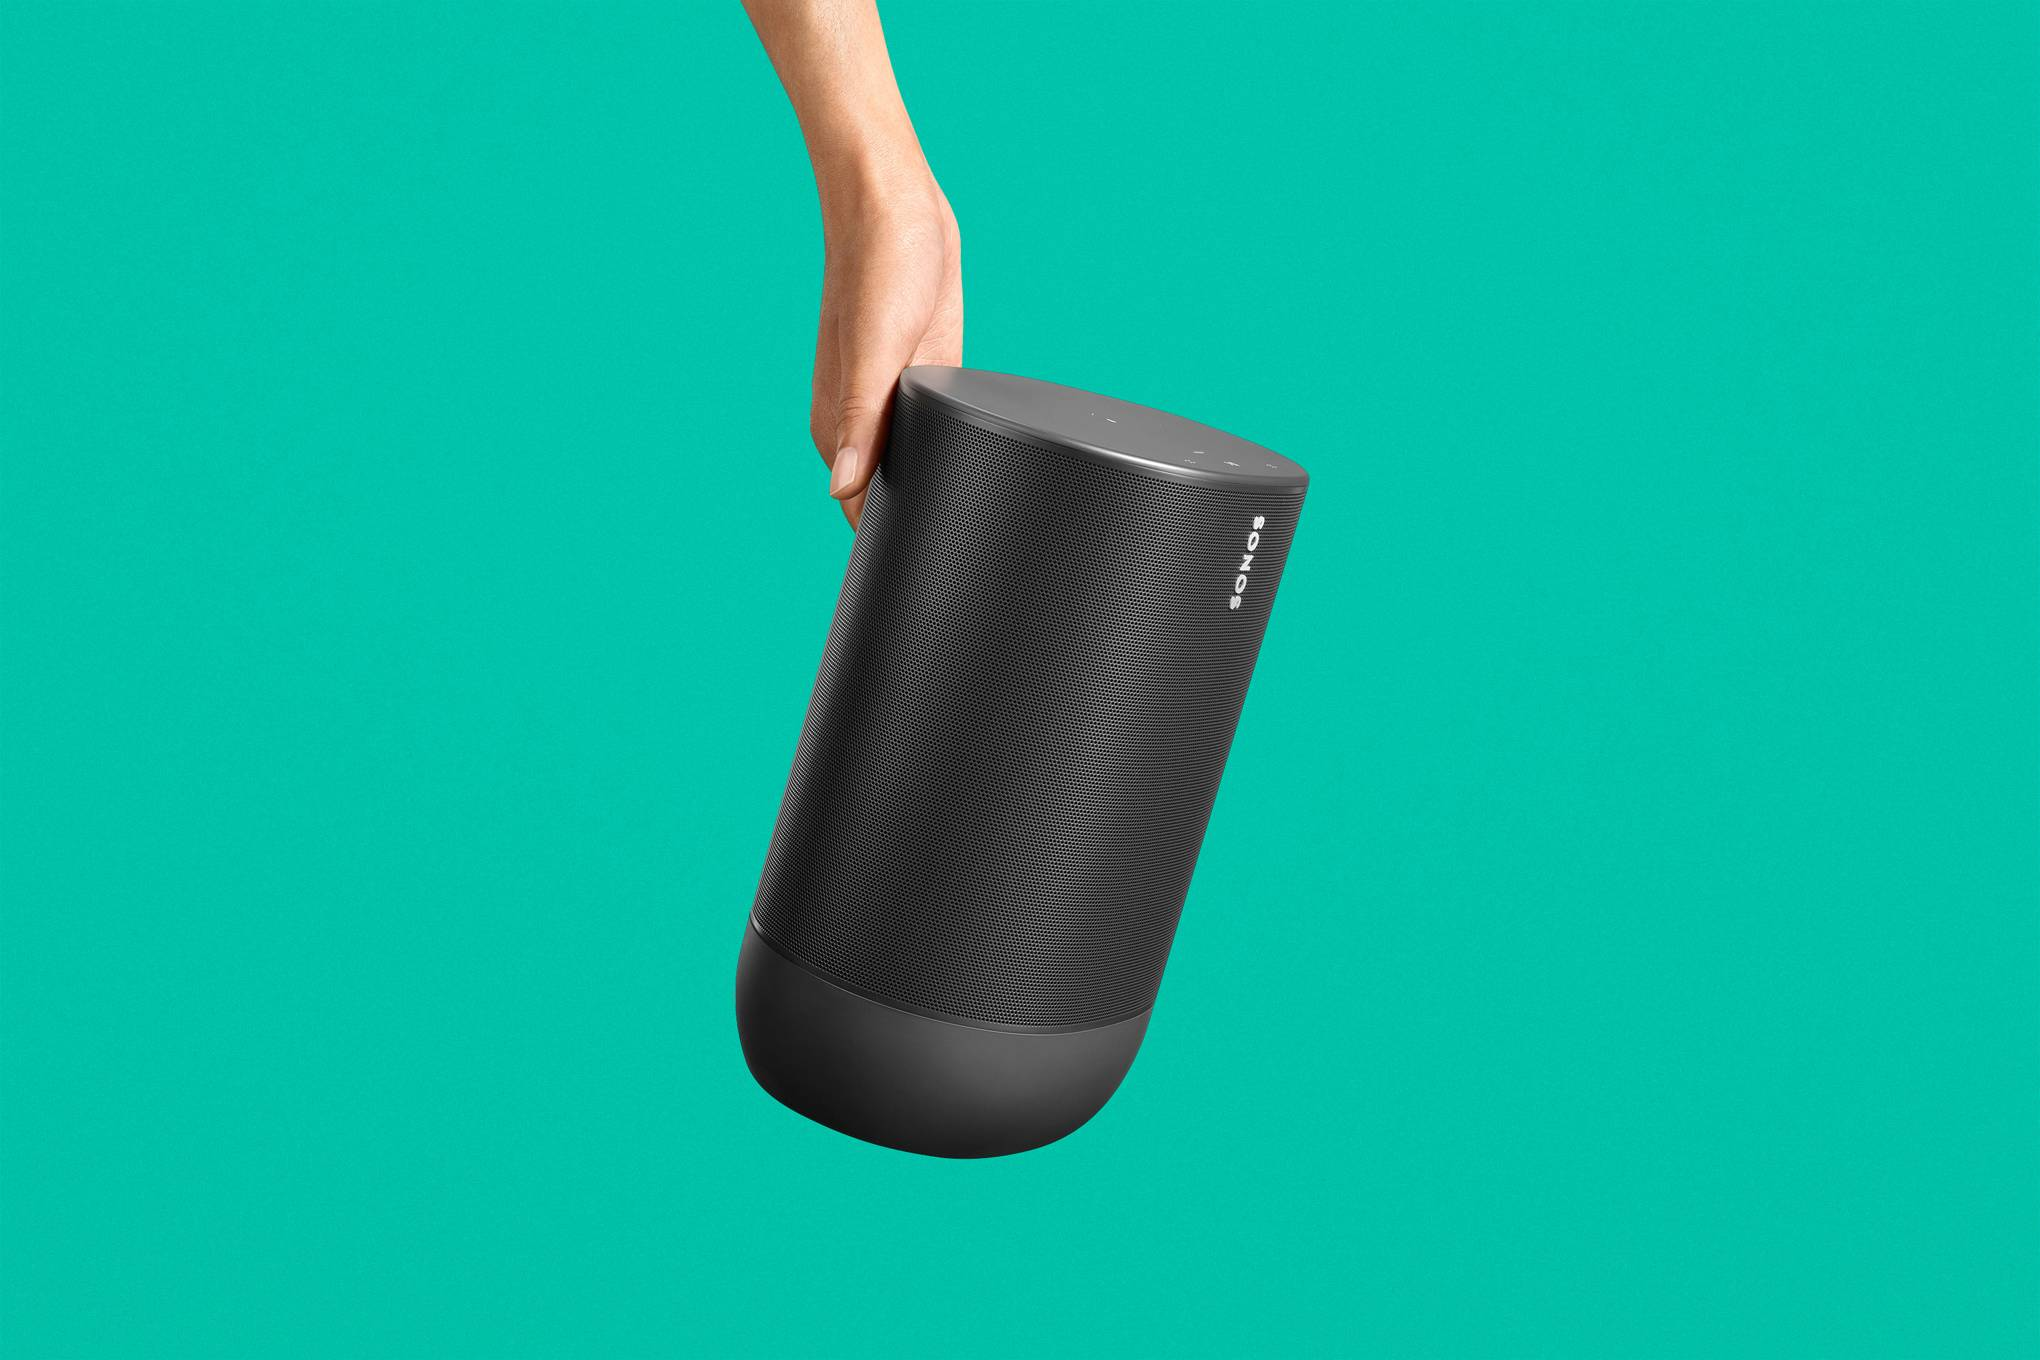 add third sonos speaker to existing system